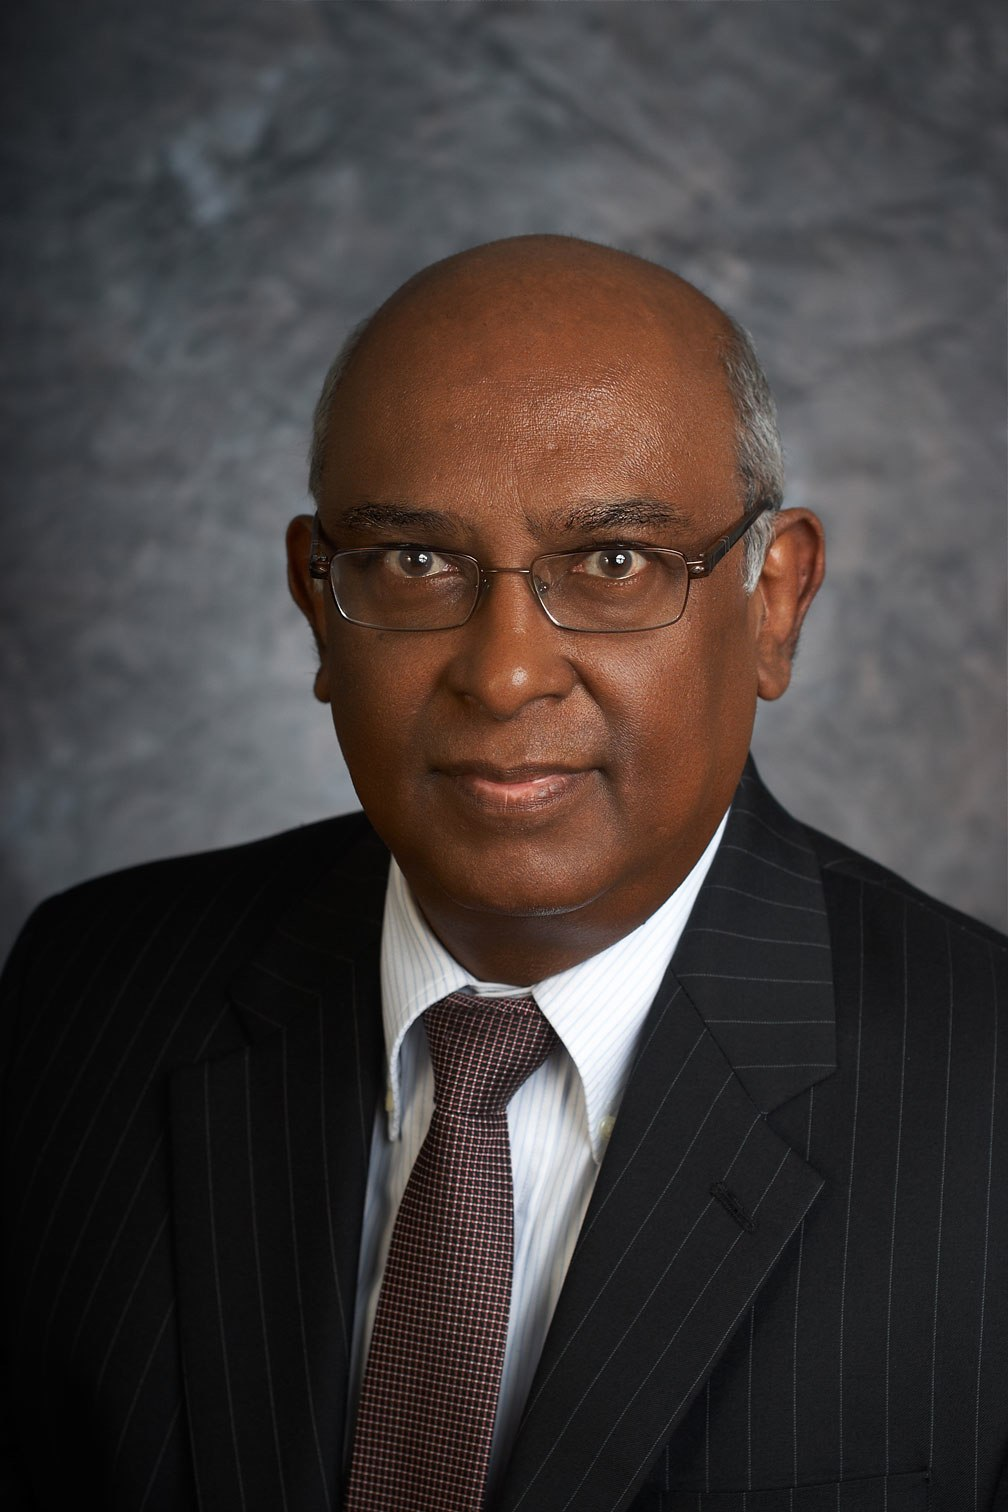 Dev-Kar « Global Financial Integrity